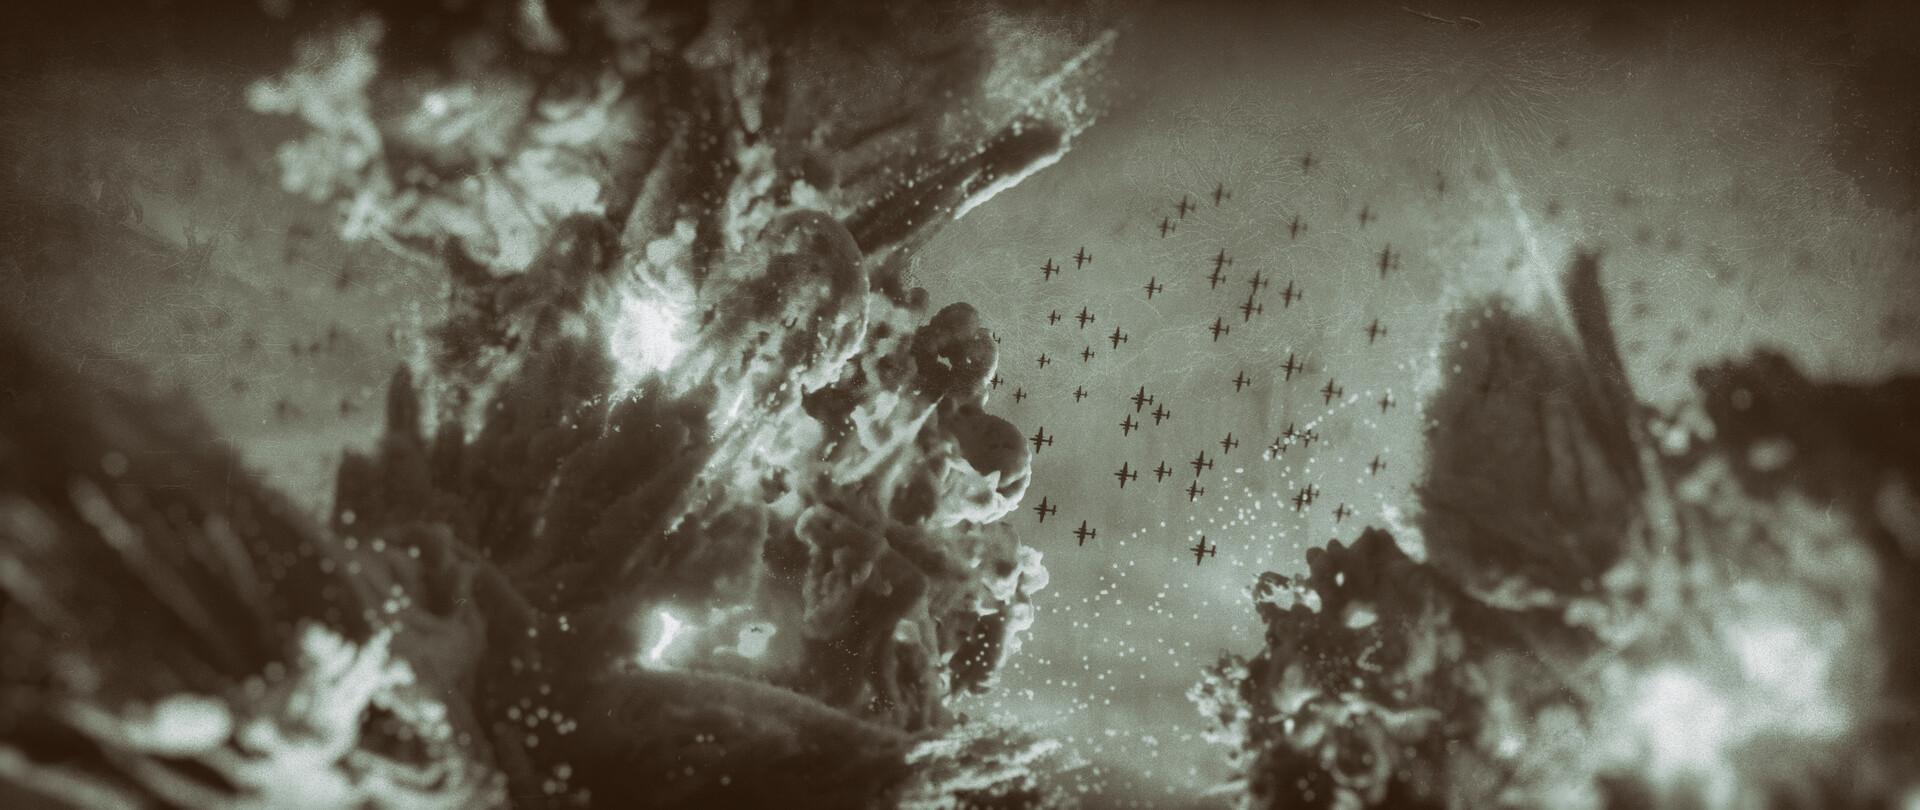 Ben nicholas bennicholas kom44 anomaly greatbombardment 04